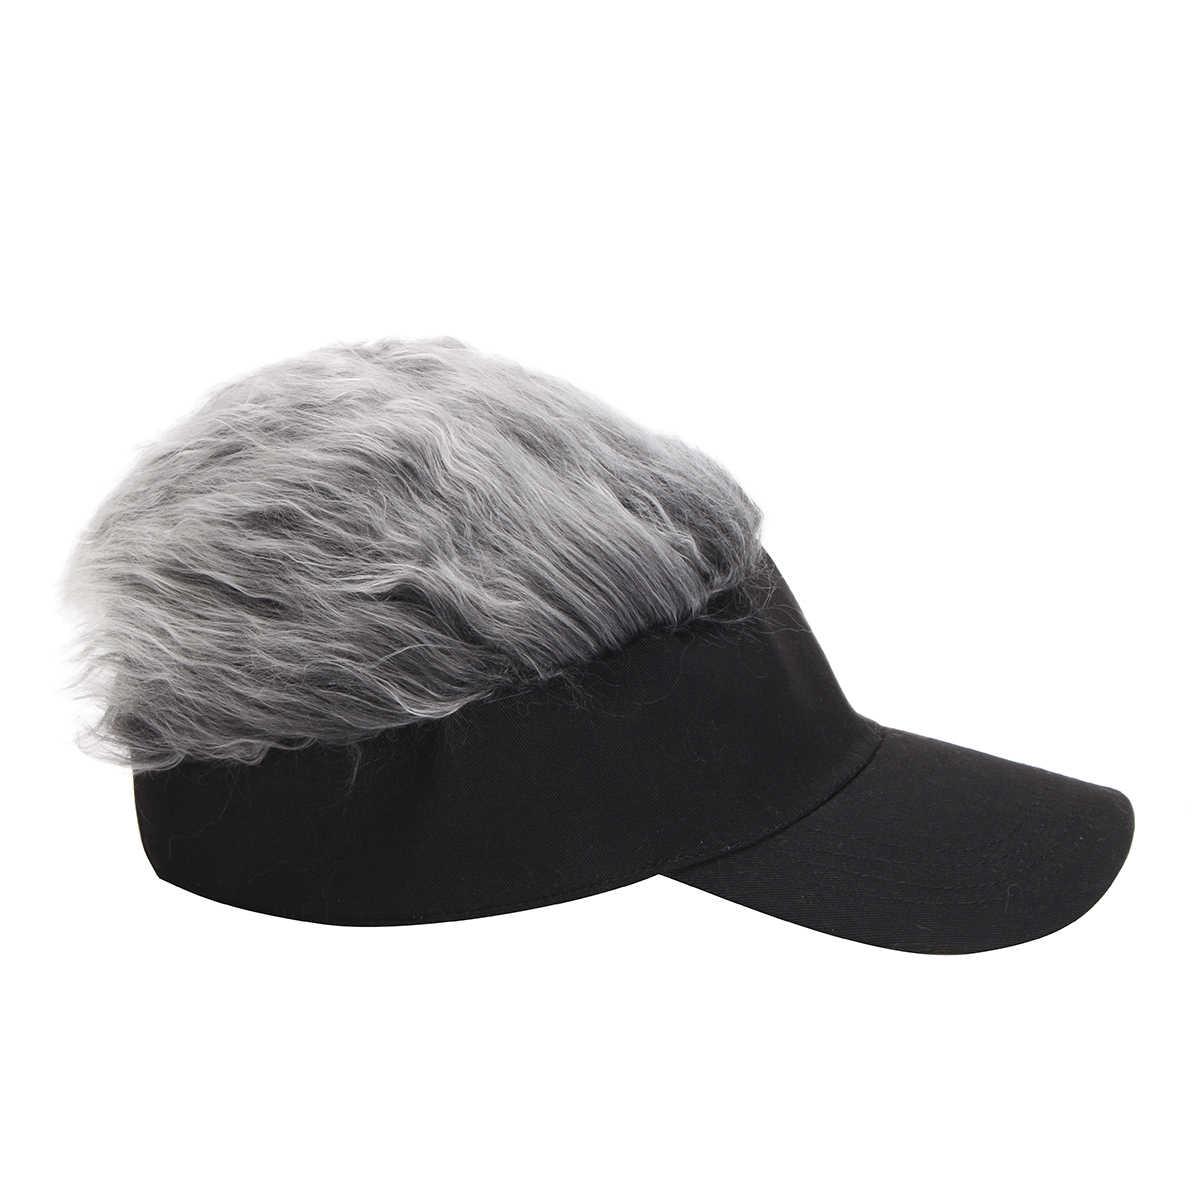 125c8f4246e ... Newest Novelty Baseball Cap Wig Cap Women Men Fake Flair Hair Visor Sun  Hat Toupee Funny ...